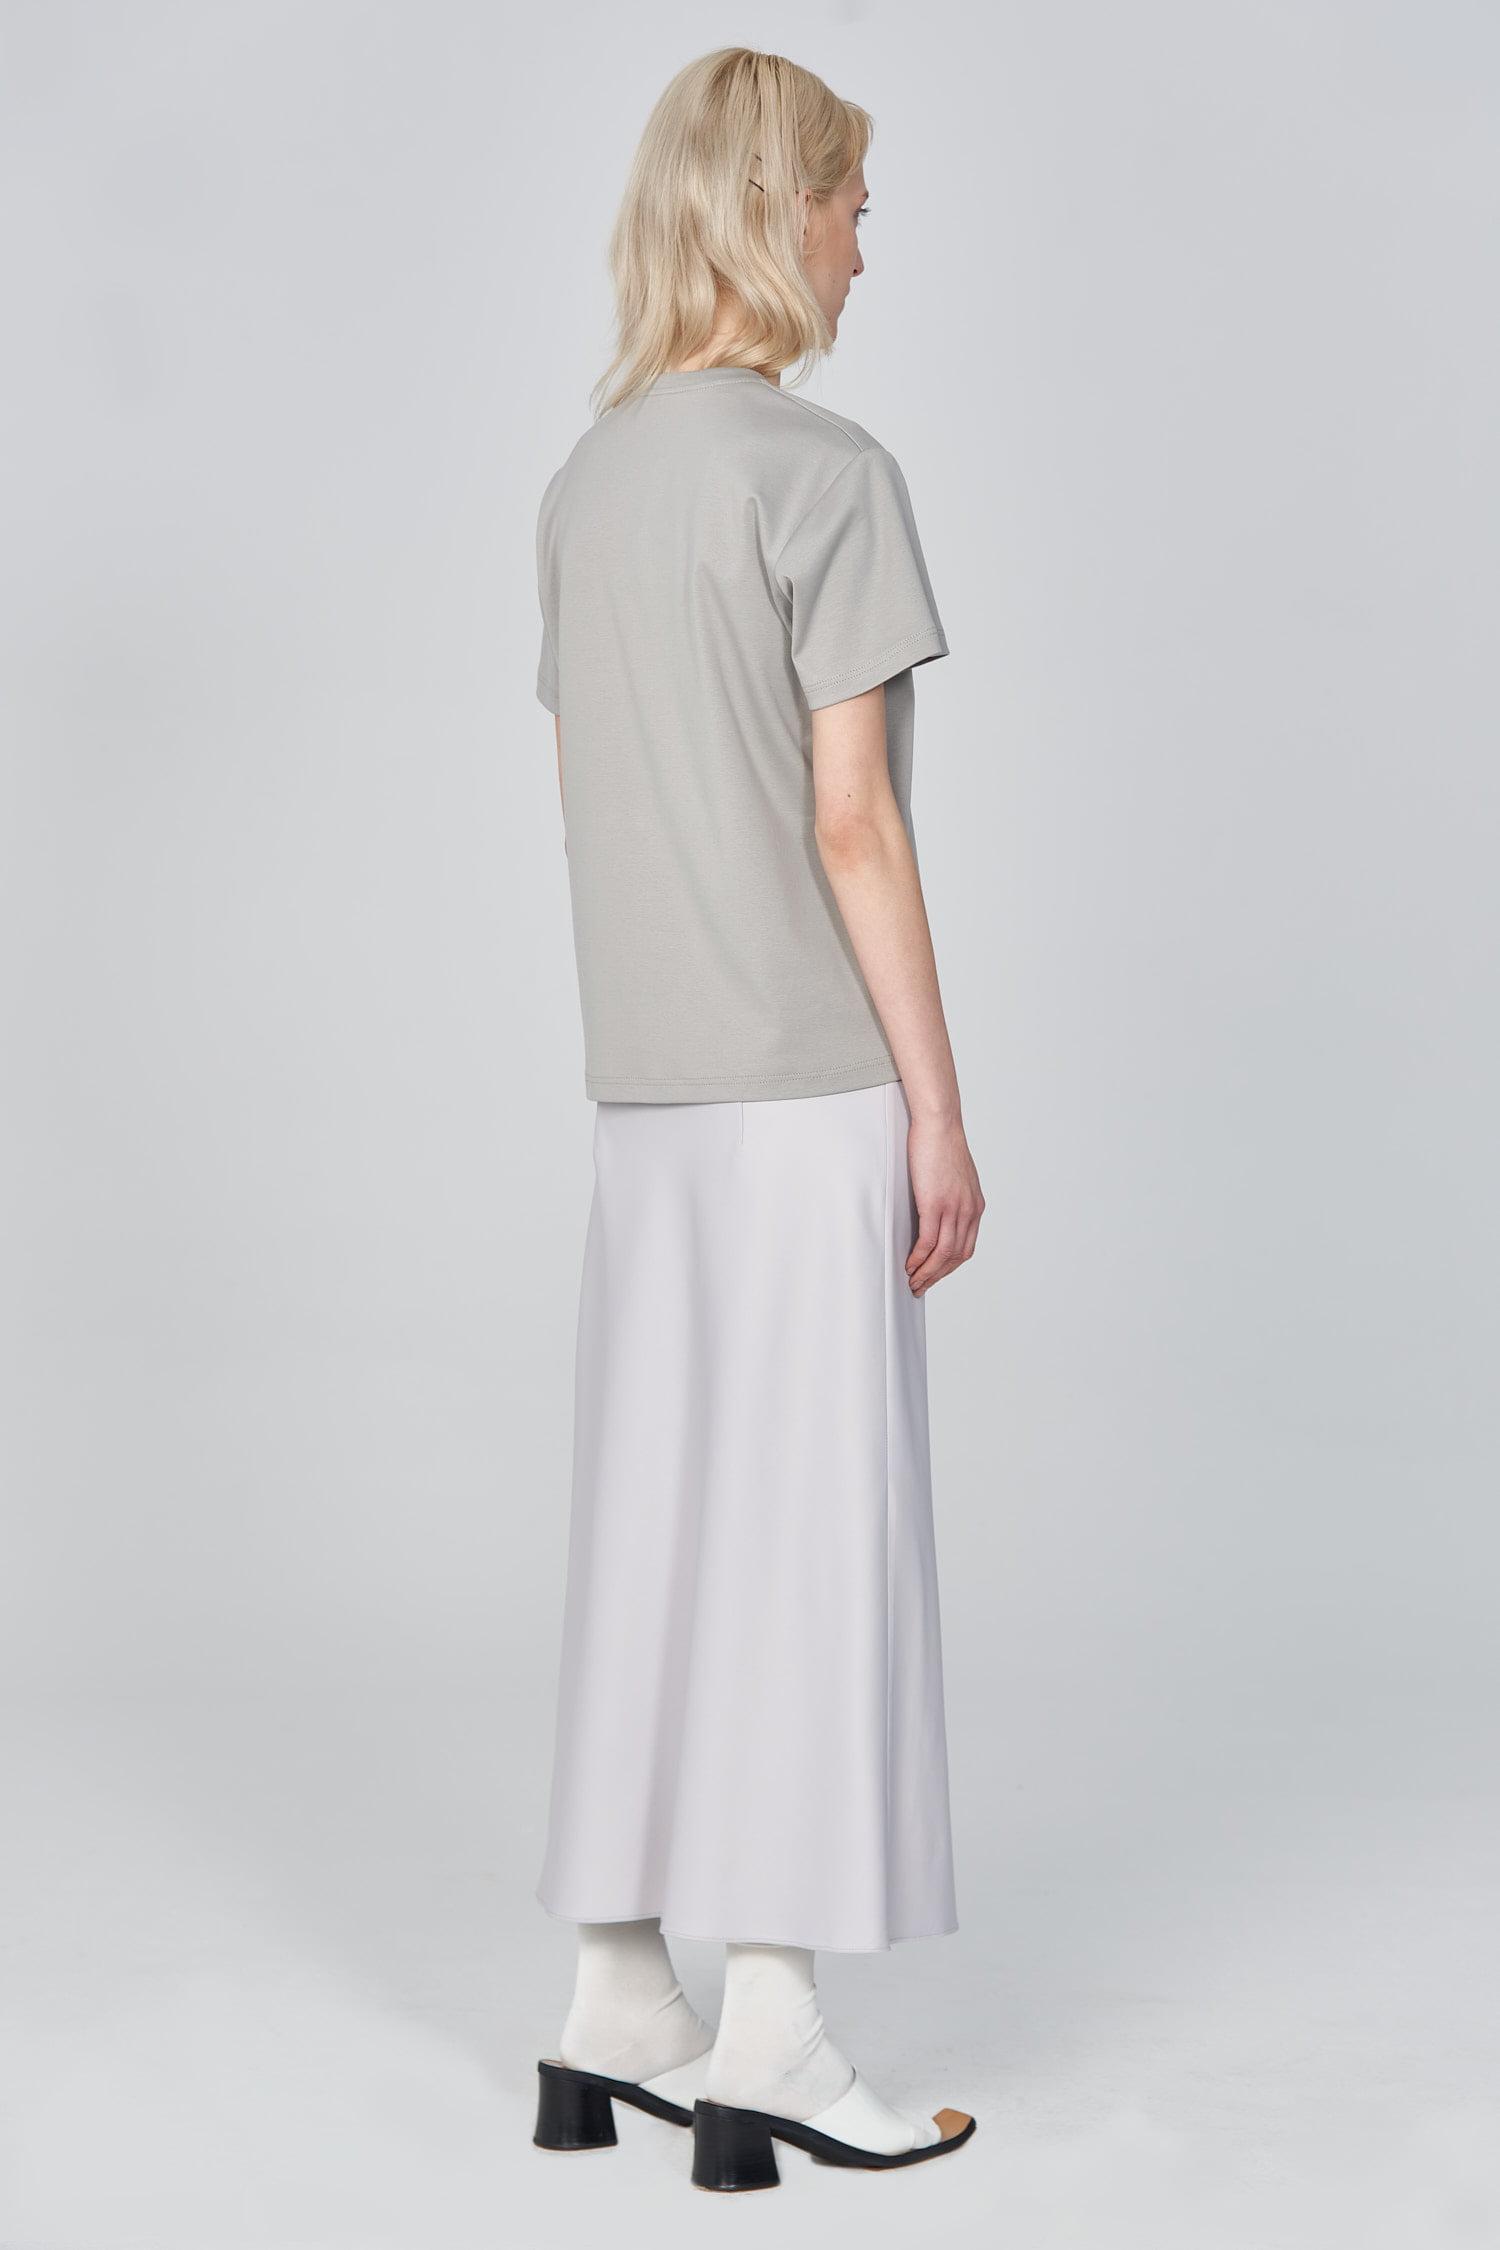 Acephala Ss21 Grey Logo T Shirt Silver Satin Skirt Sice Back